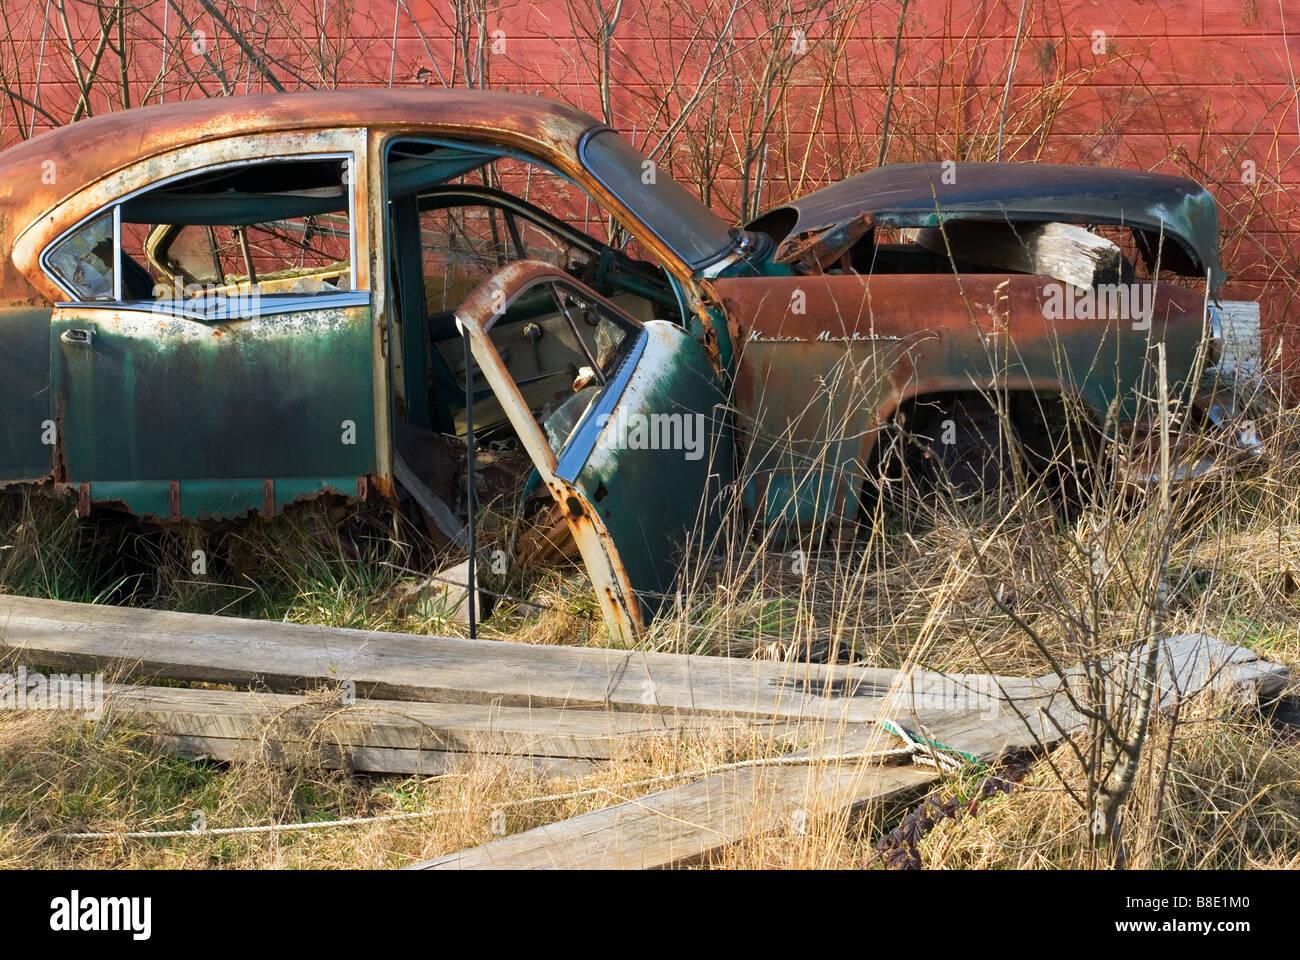 A car wreck. - Stock Image